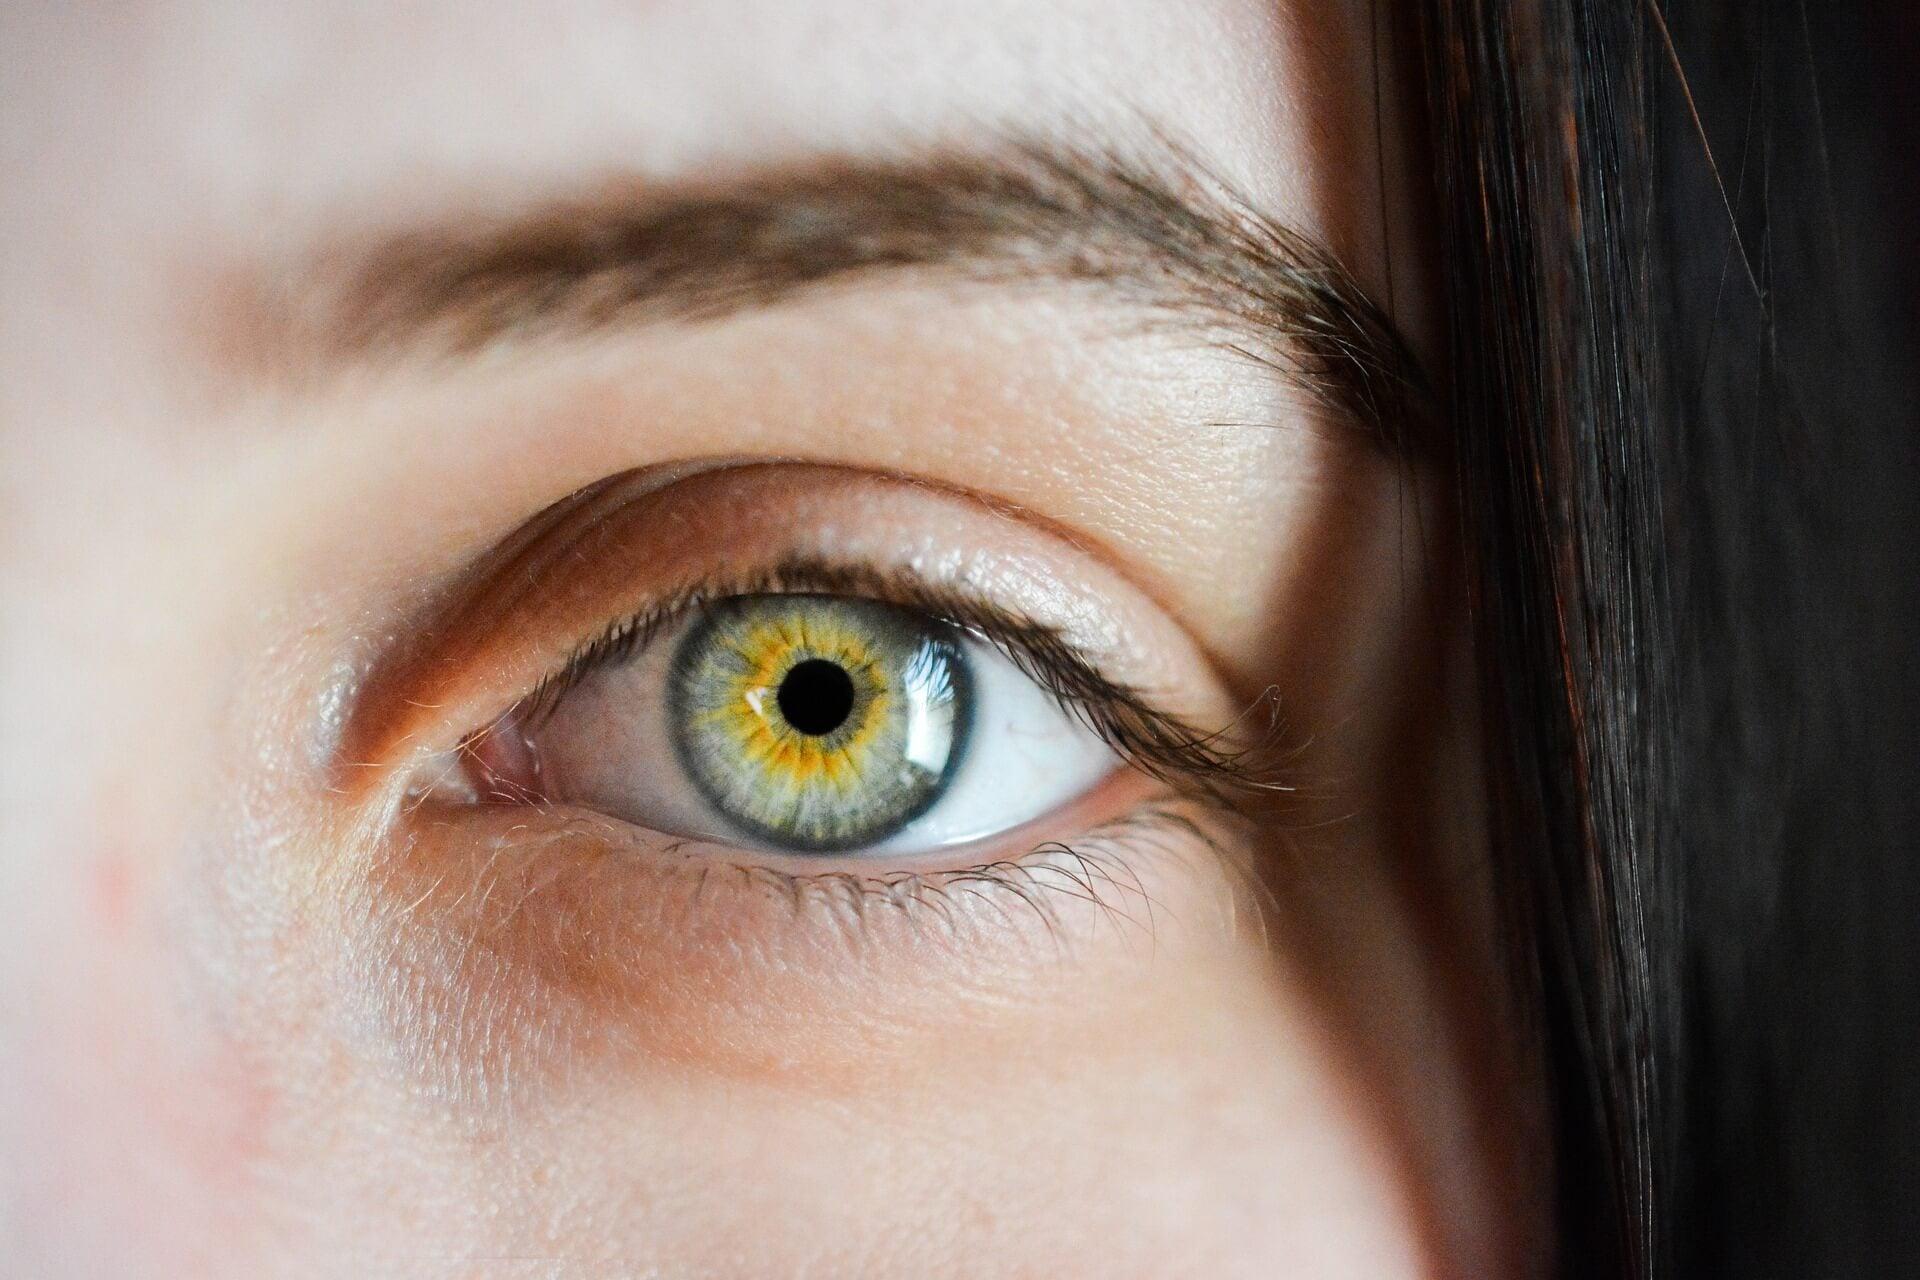 Баклажан улучшает зрение